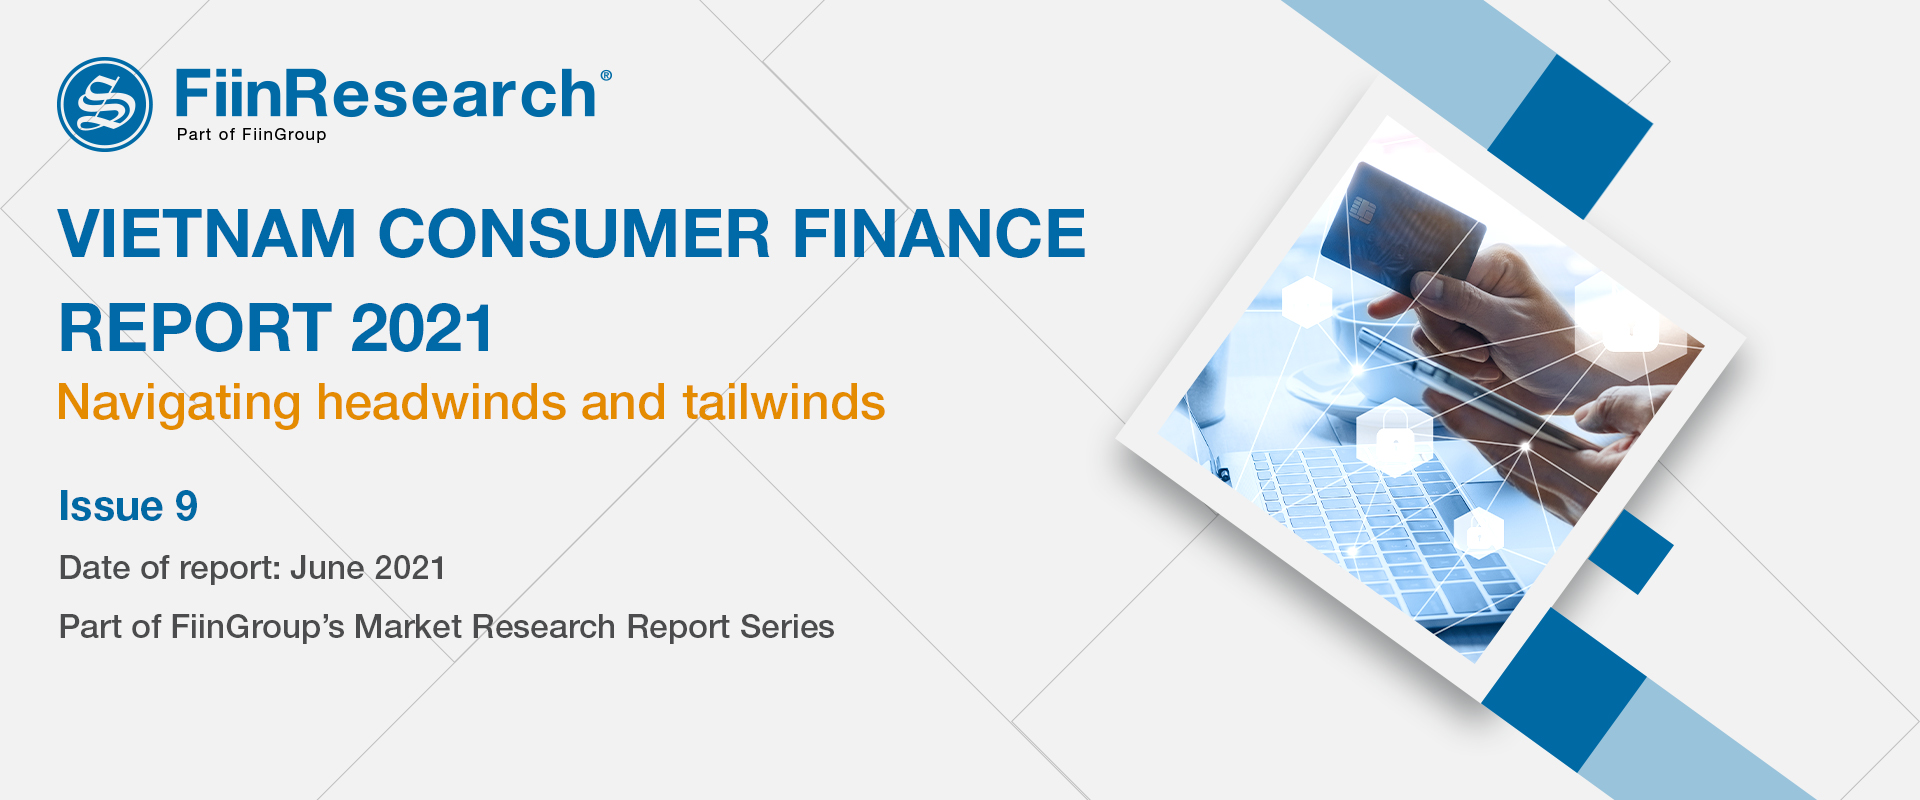 Vietnam Consumer Finance Market 2021 Report